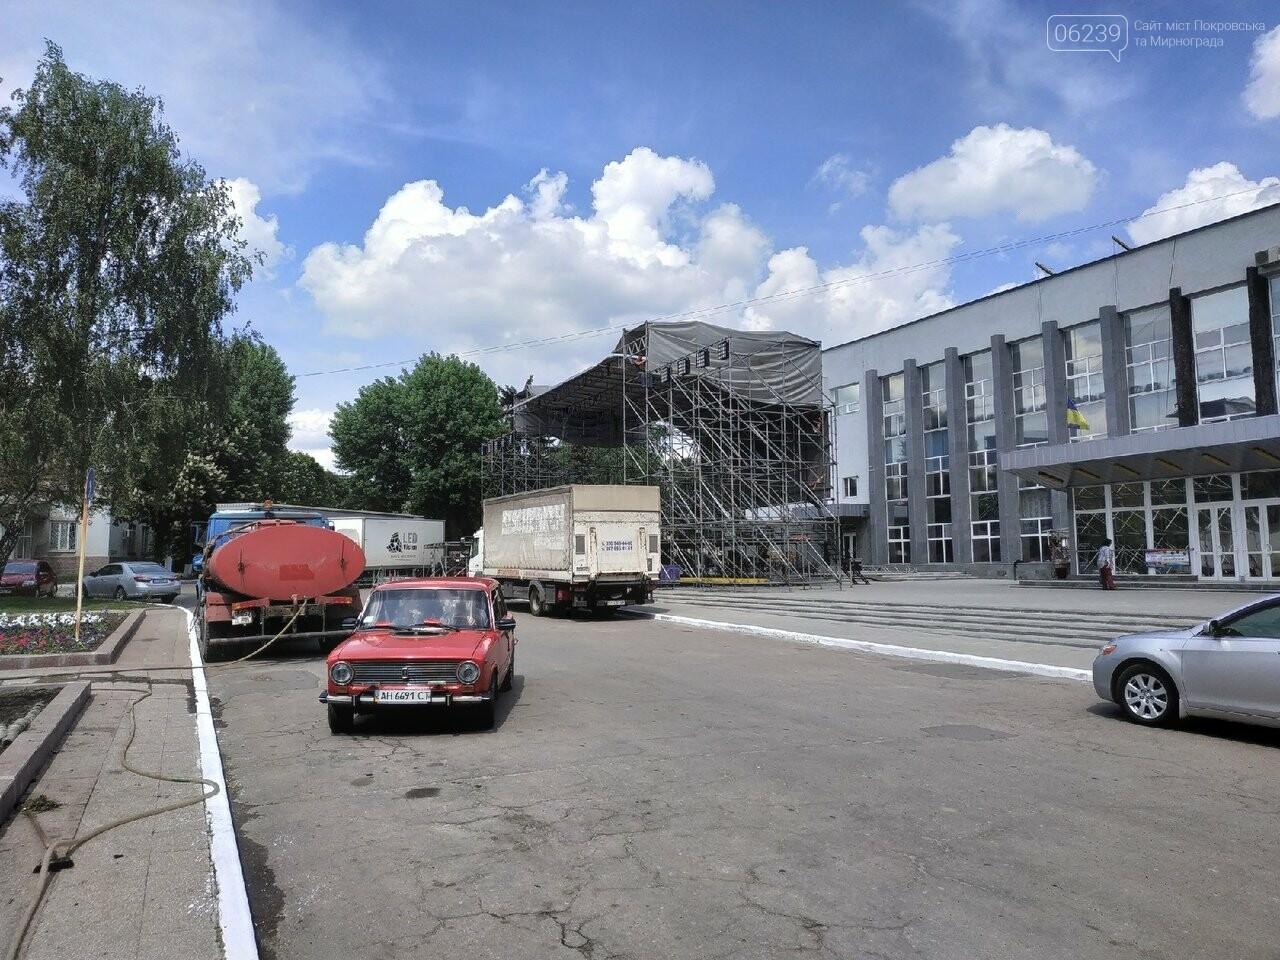 В Покровске на площади Шибанкова проходит подготовка ко Дню Европы, фото-2